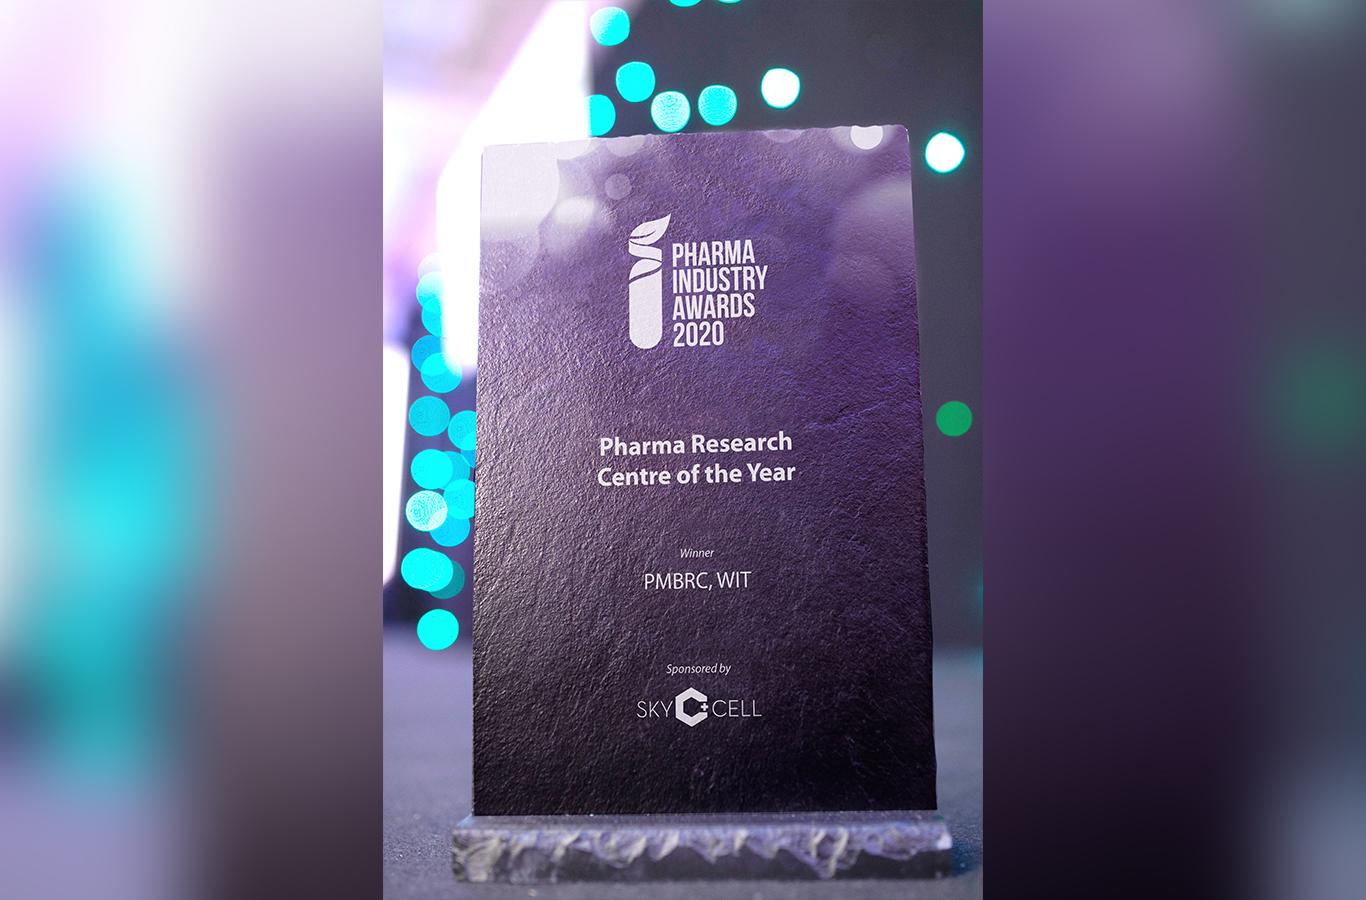 PMBRC Pharma Industry Award 2020